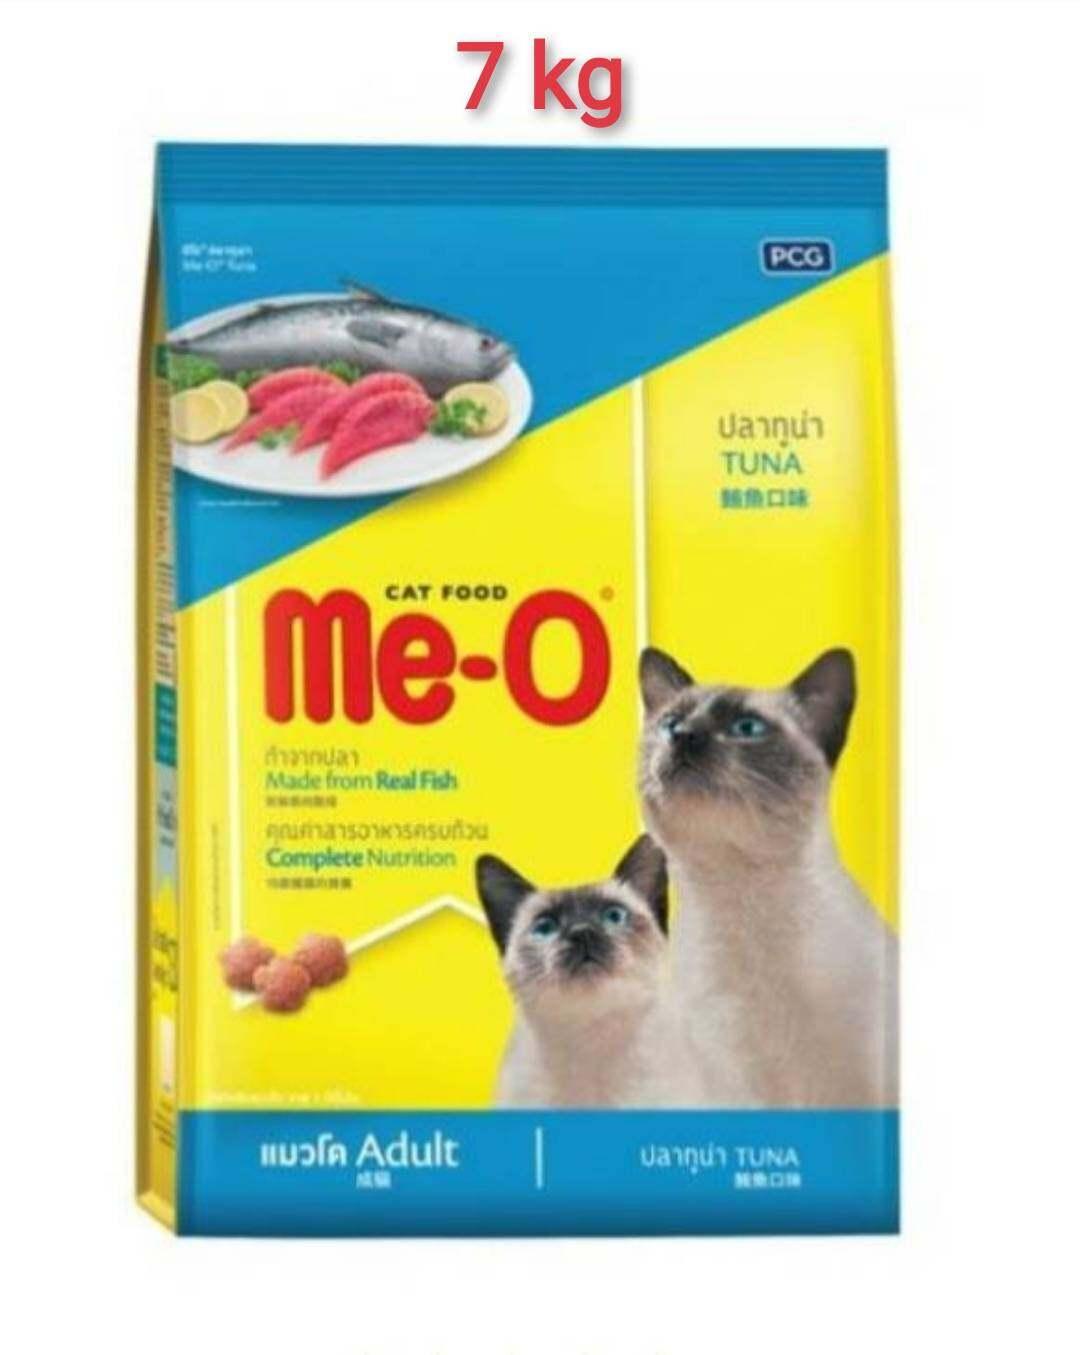 Me-O มีโอ ปลาทูน่า อาหารแมวสำเร็จรูปชนิดเม็ด สำหรับแมวโตอายุ 1 ปีขึ้นไป 7กก..